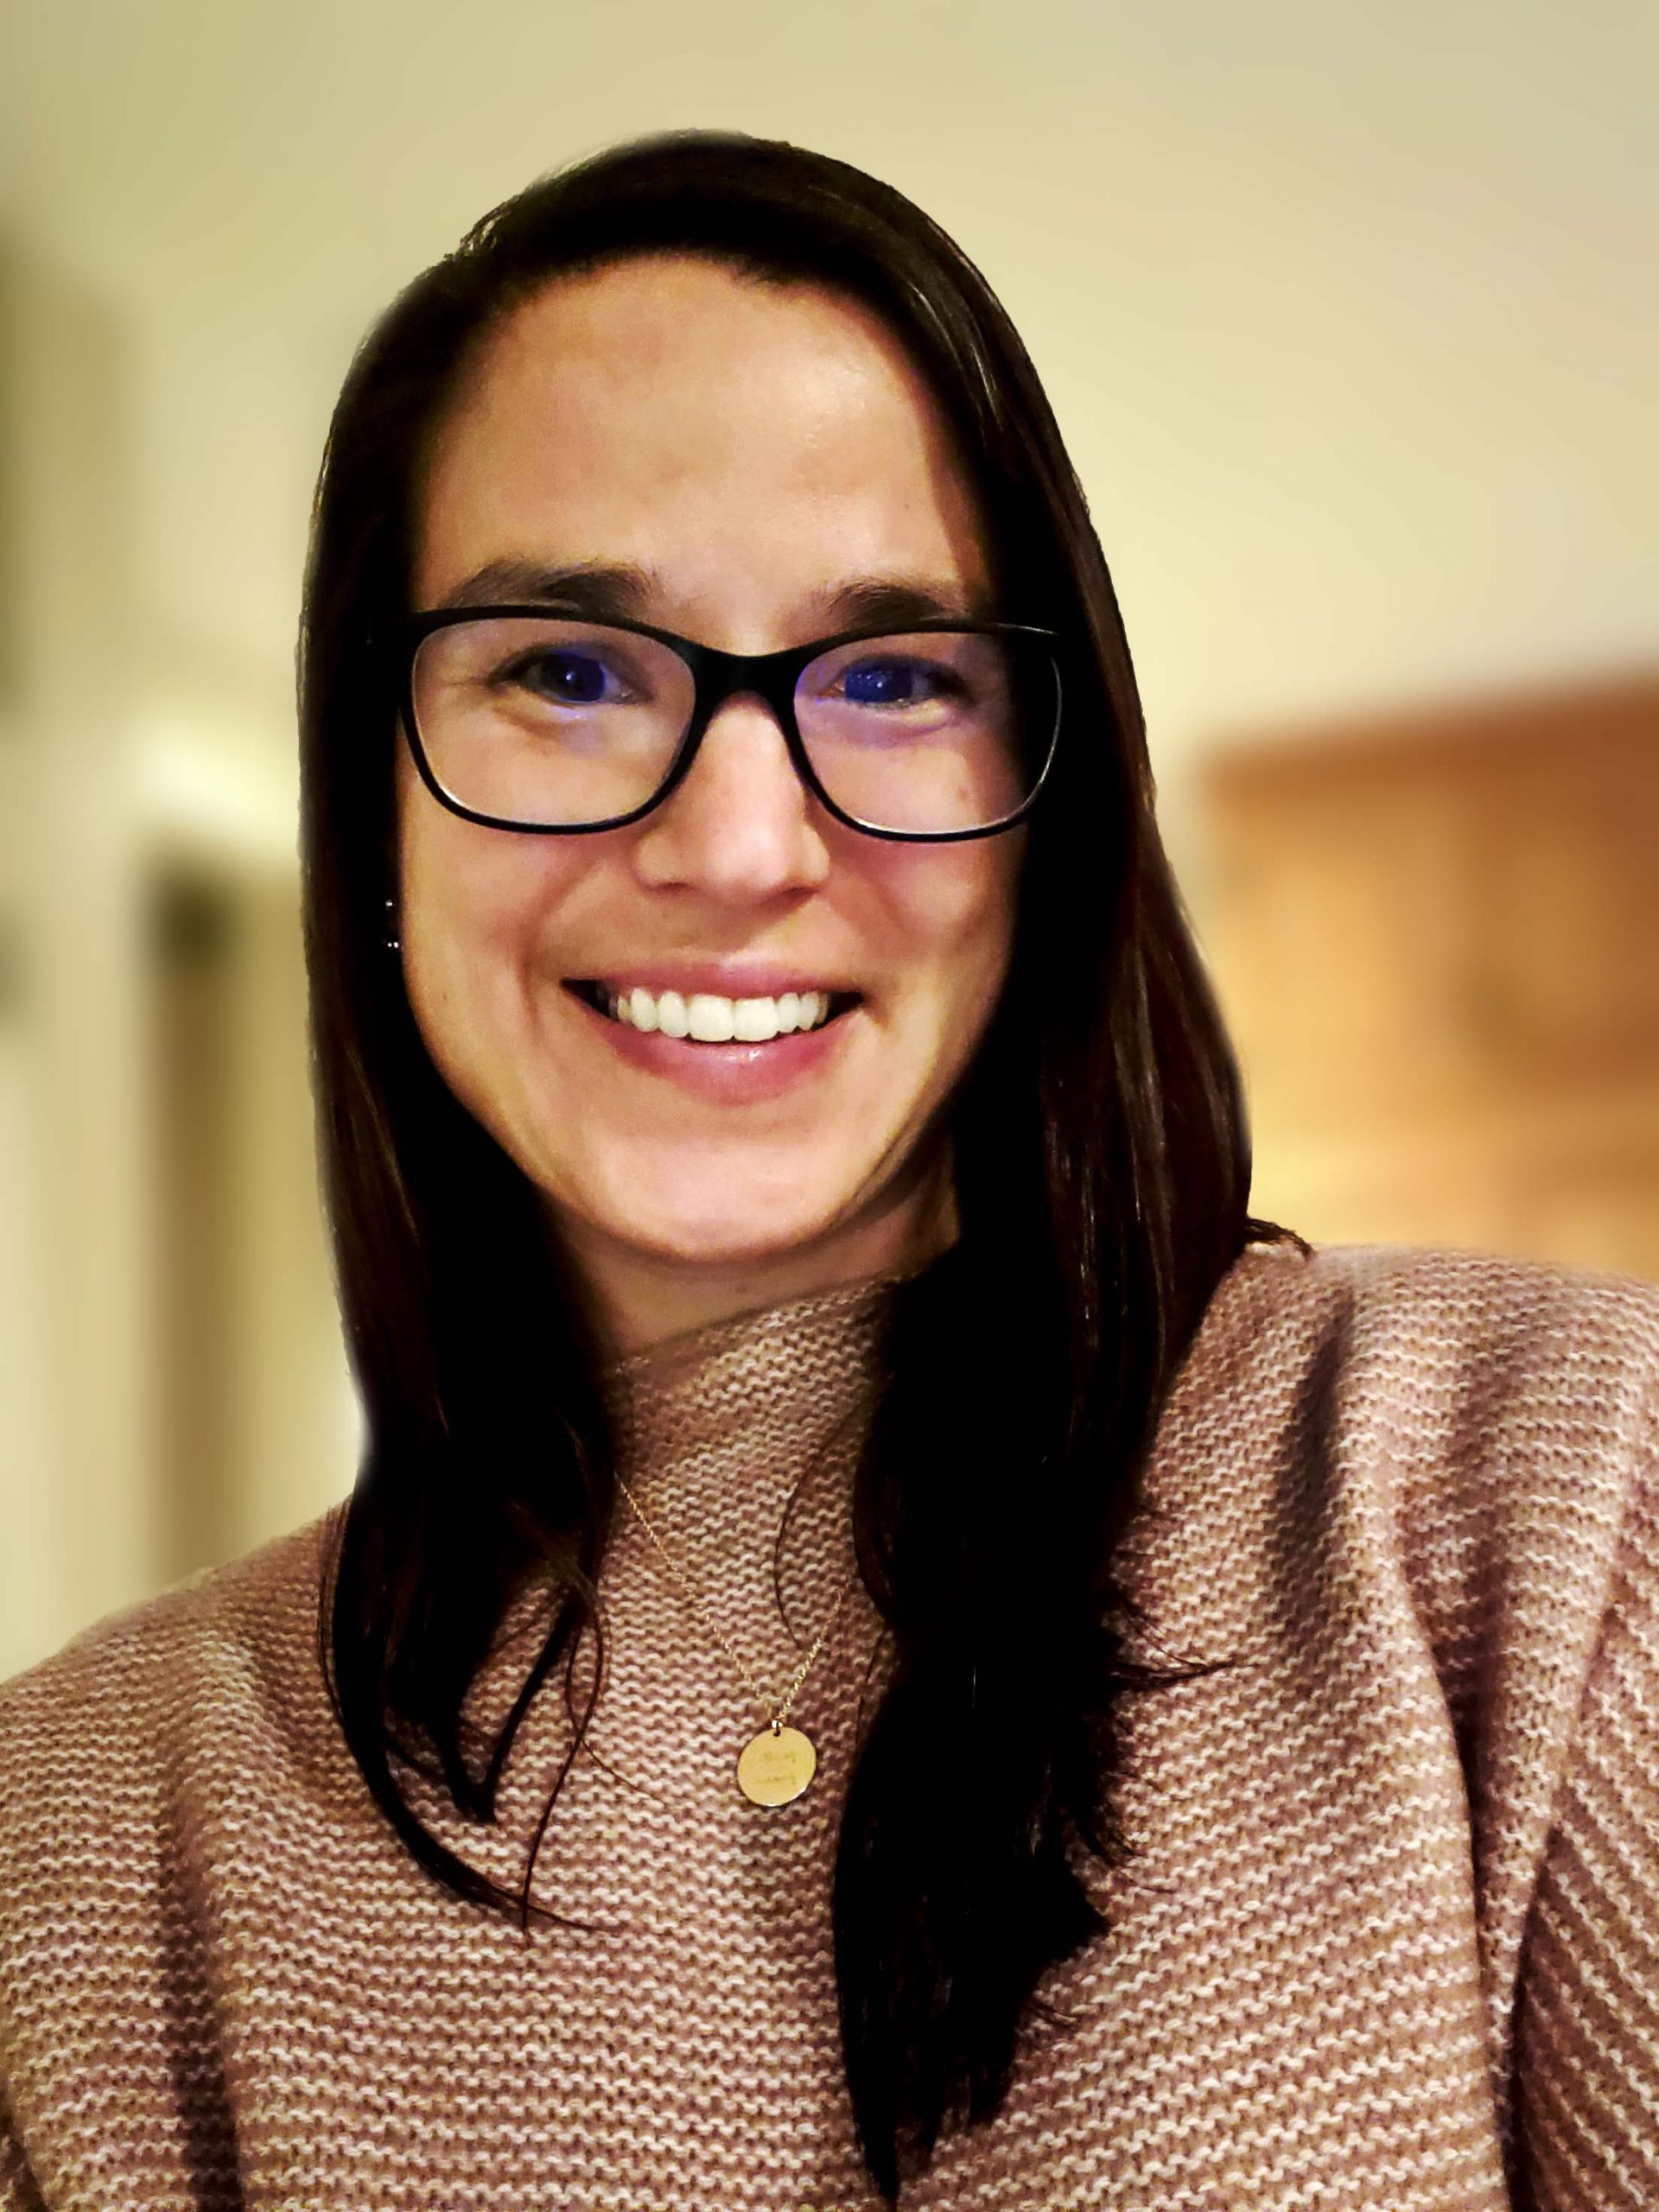 Catherine Dorrington - Owner, Coastal Care Solutions